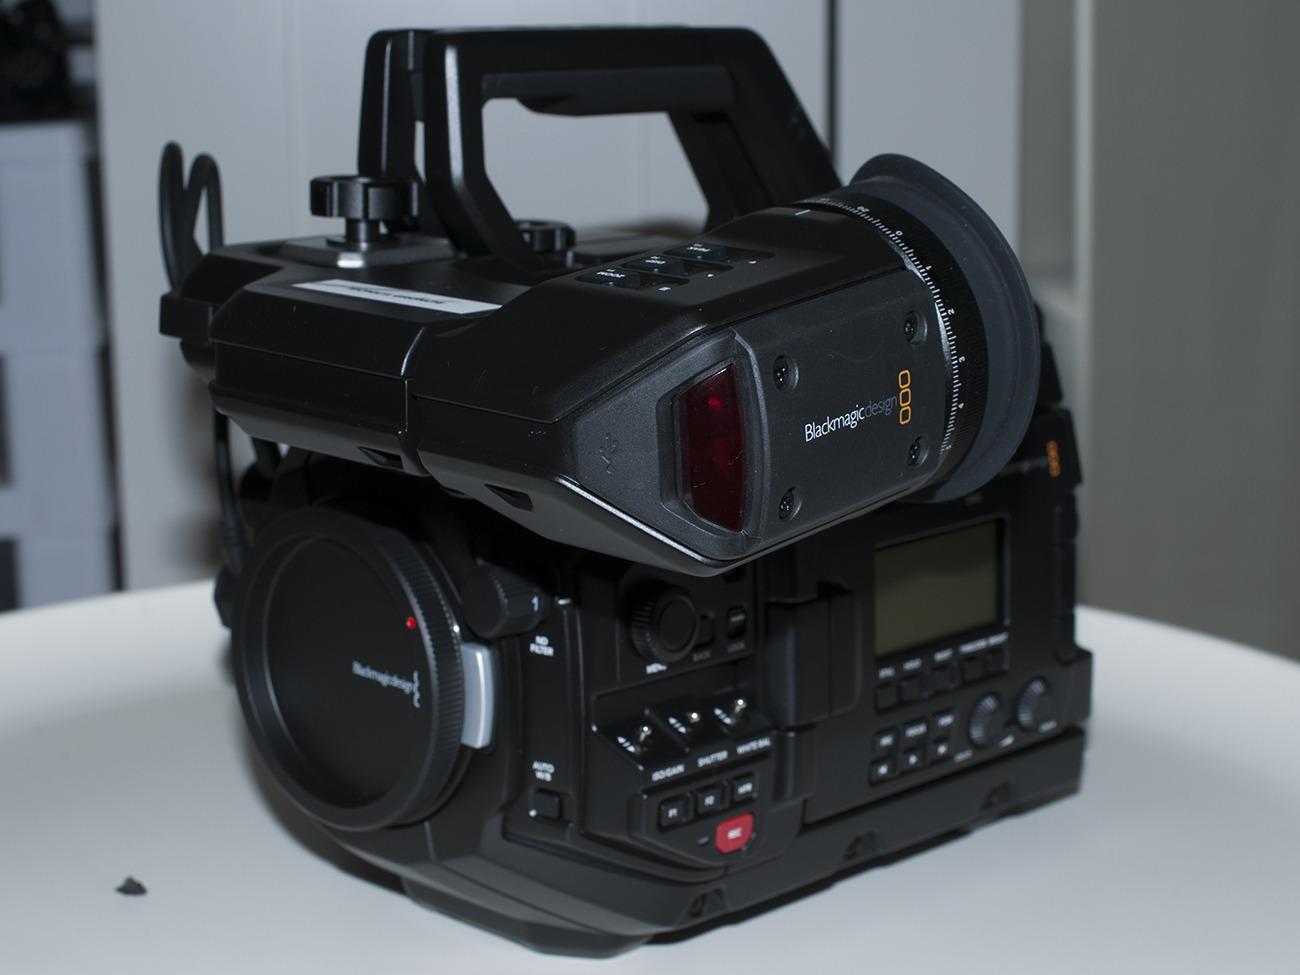 Rent Blackmagic Design Ursa Mini Pro 4 6k Digital Cinema In New York Rent For 175 00 Day 142 86 Week